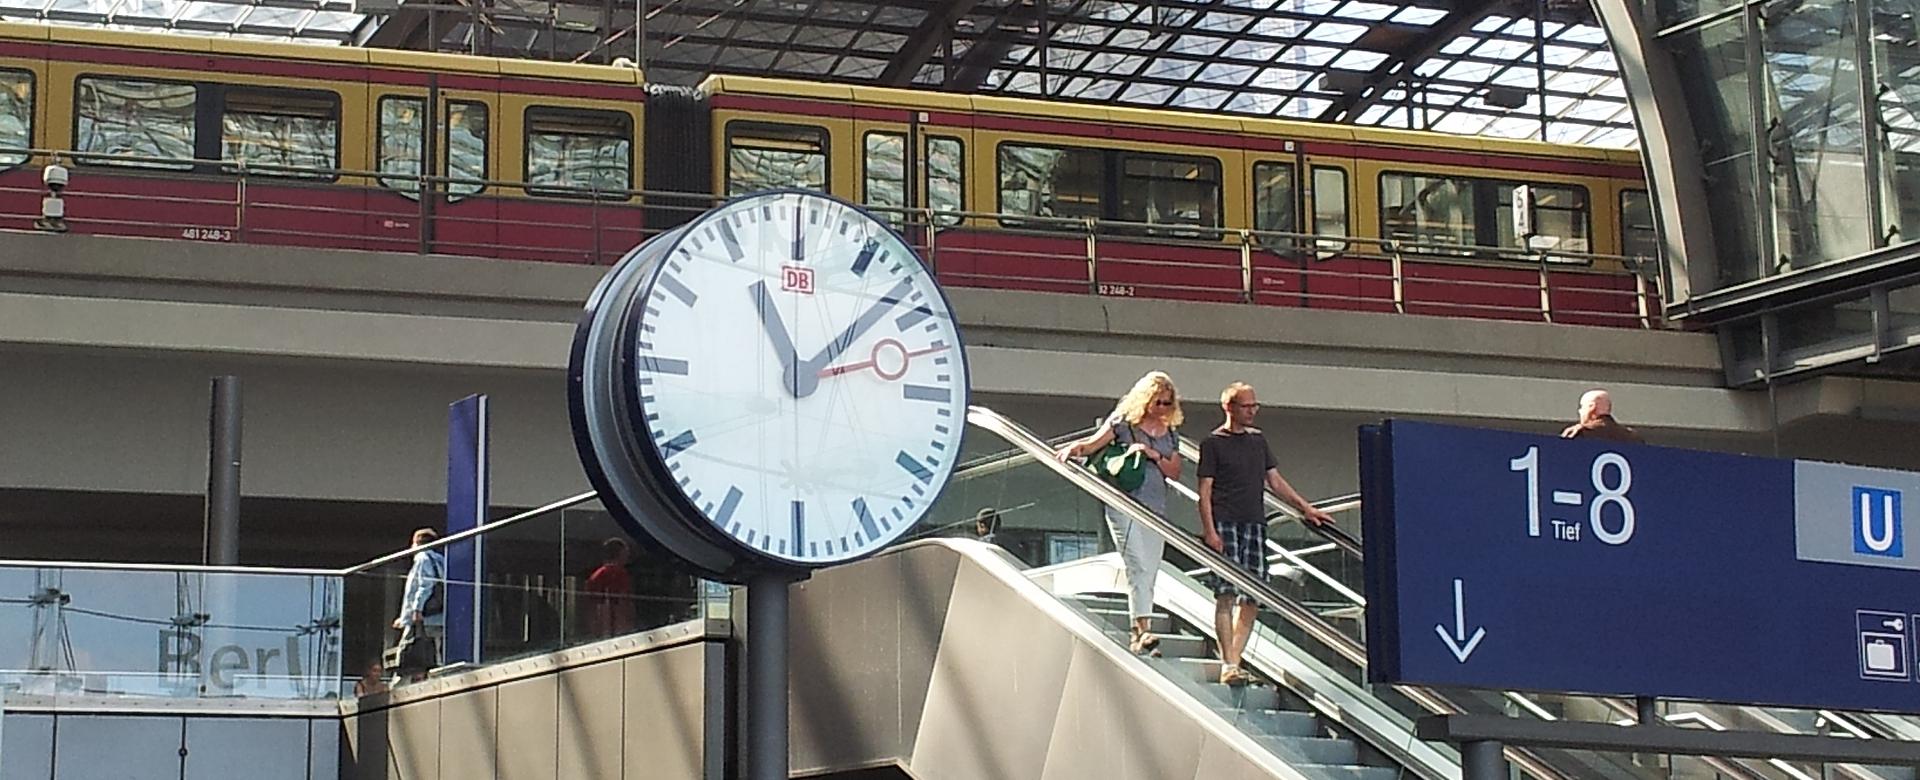 <h2>Bahnuhren von BÜRK MOBATIME</h2> <p></p> <p></p> <p></p> <p></p>